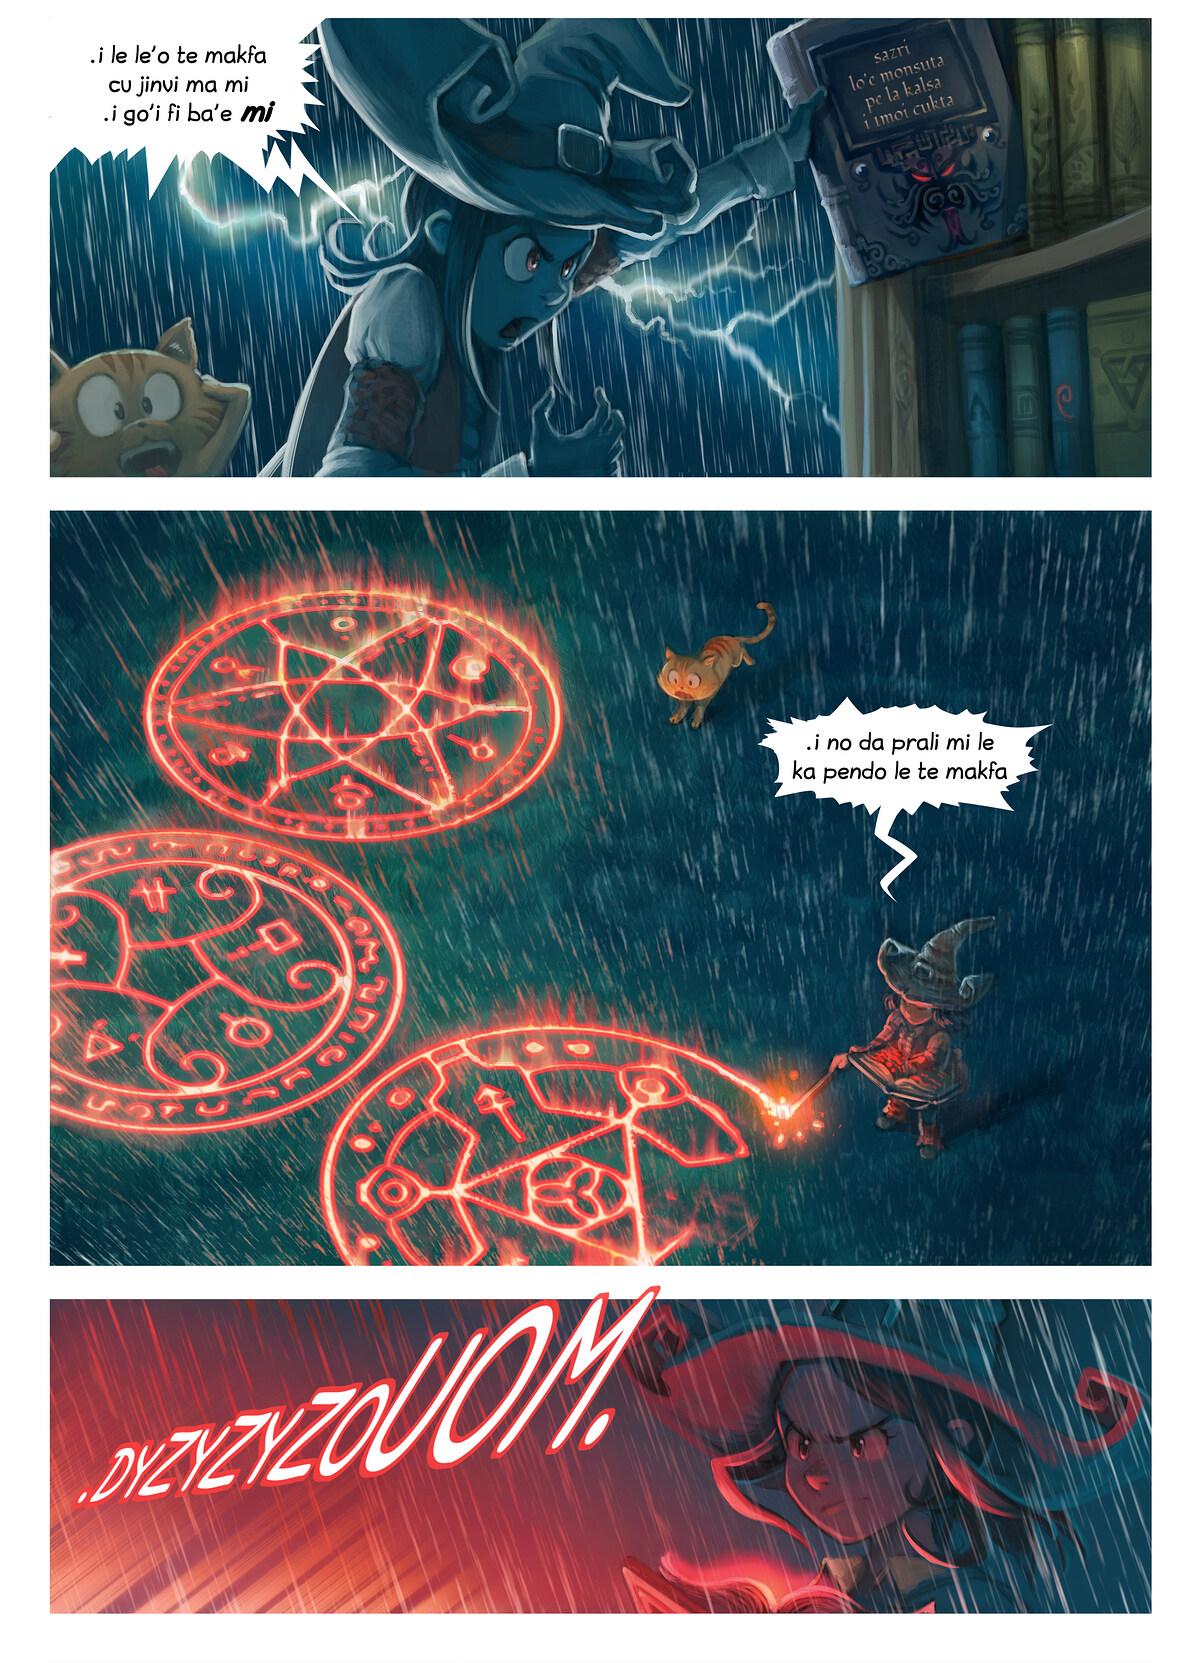 A webcomic page of Pepper&Carrot, pagbu 8 [jb], papri 5